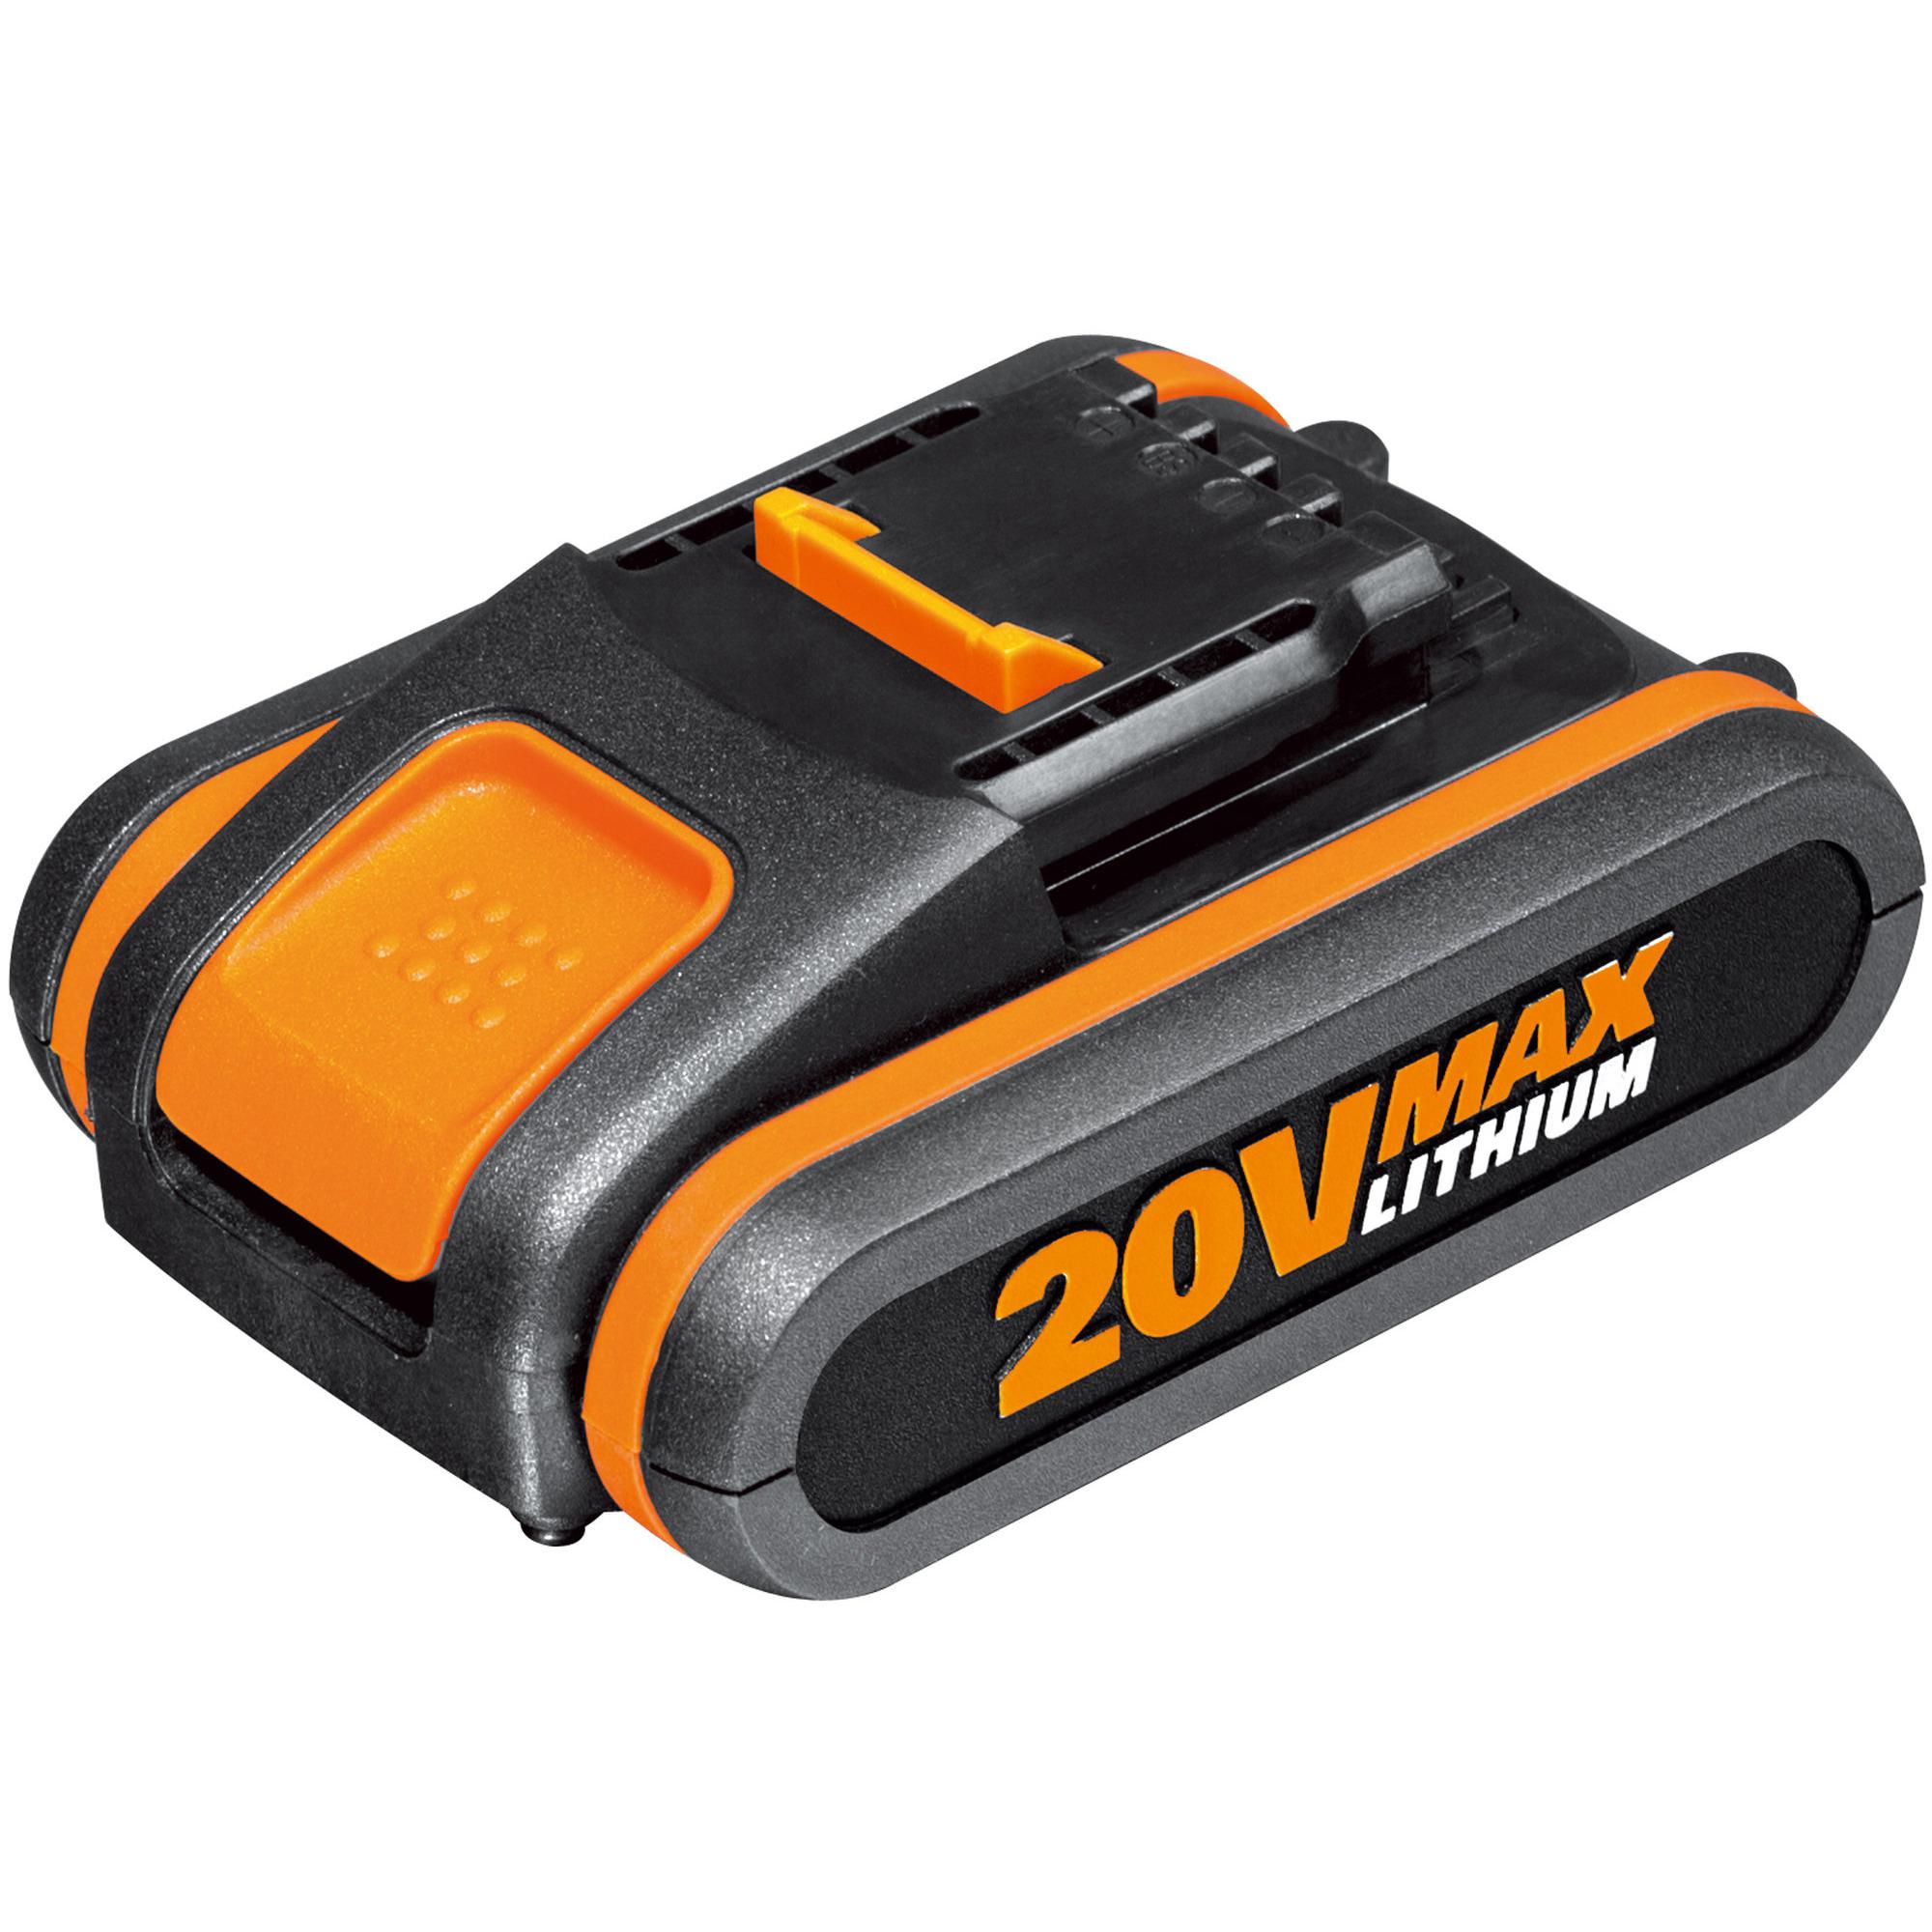 Worx WA3551 20V 2.0Ah-batteri med indikator